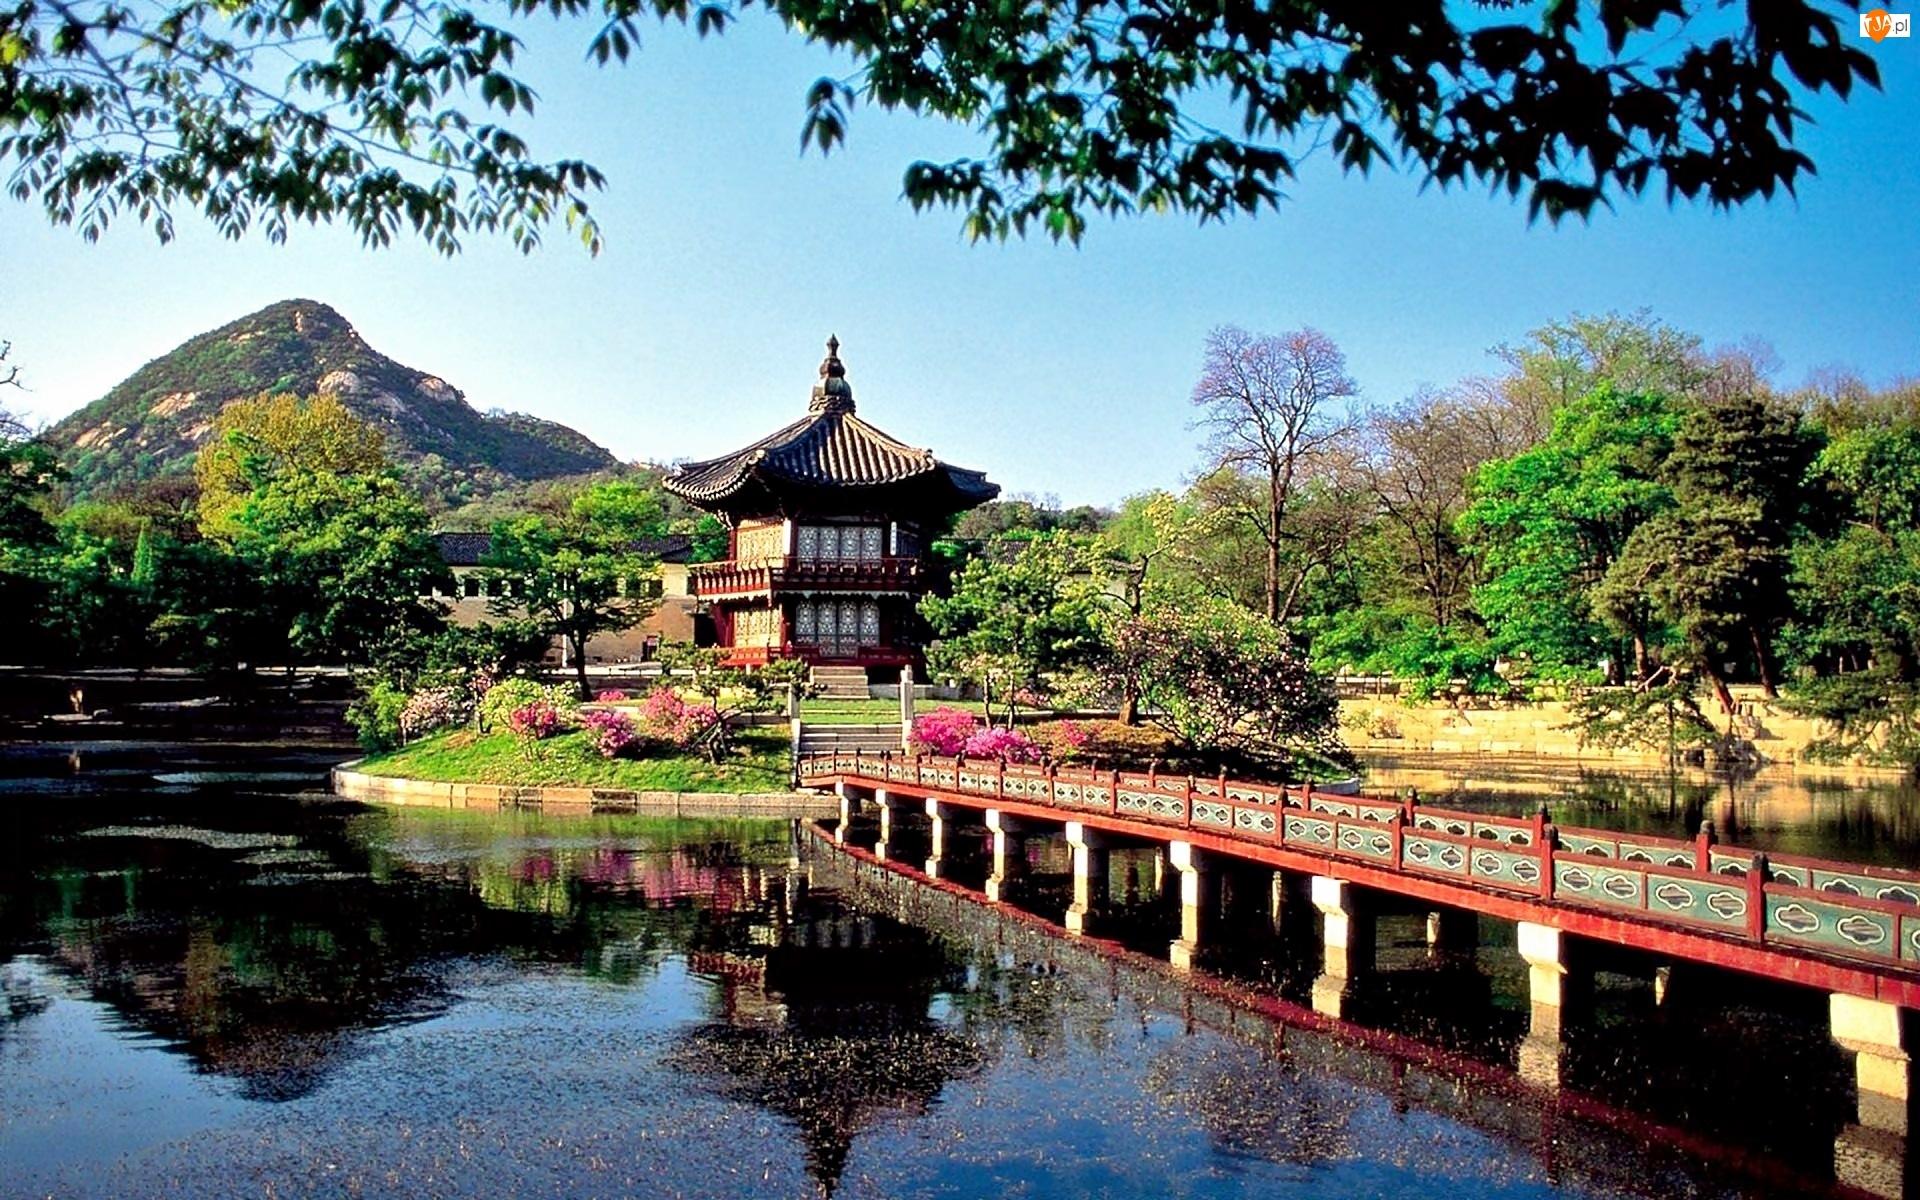 Jezioro, Jong, Changwon, Miasto, Most, Pawilon, Park